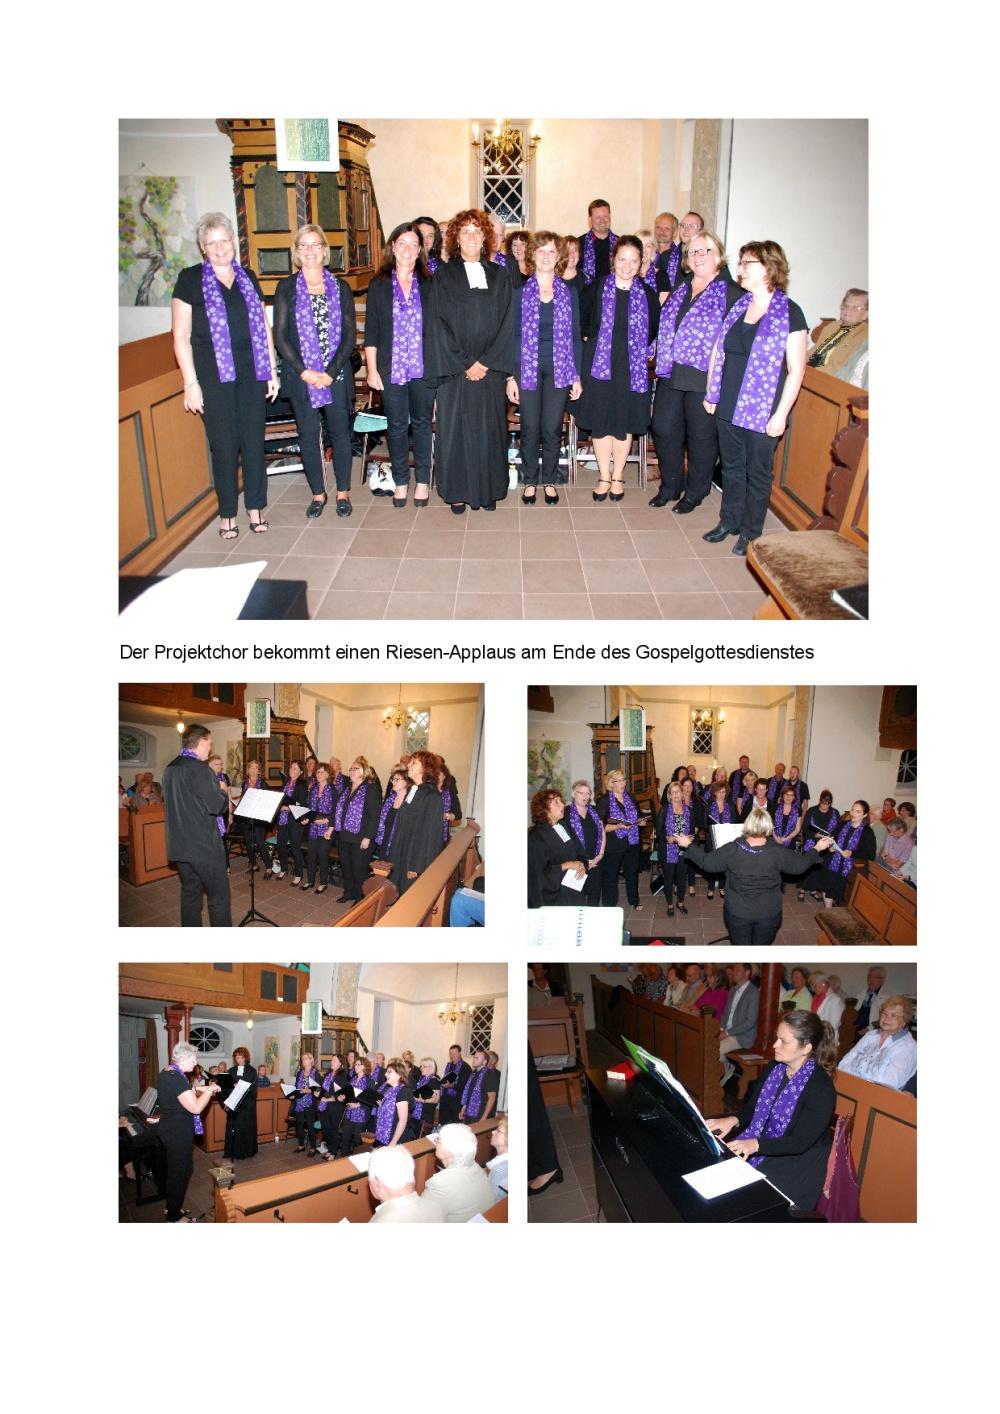 2016-09-25-gospel-godi-003